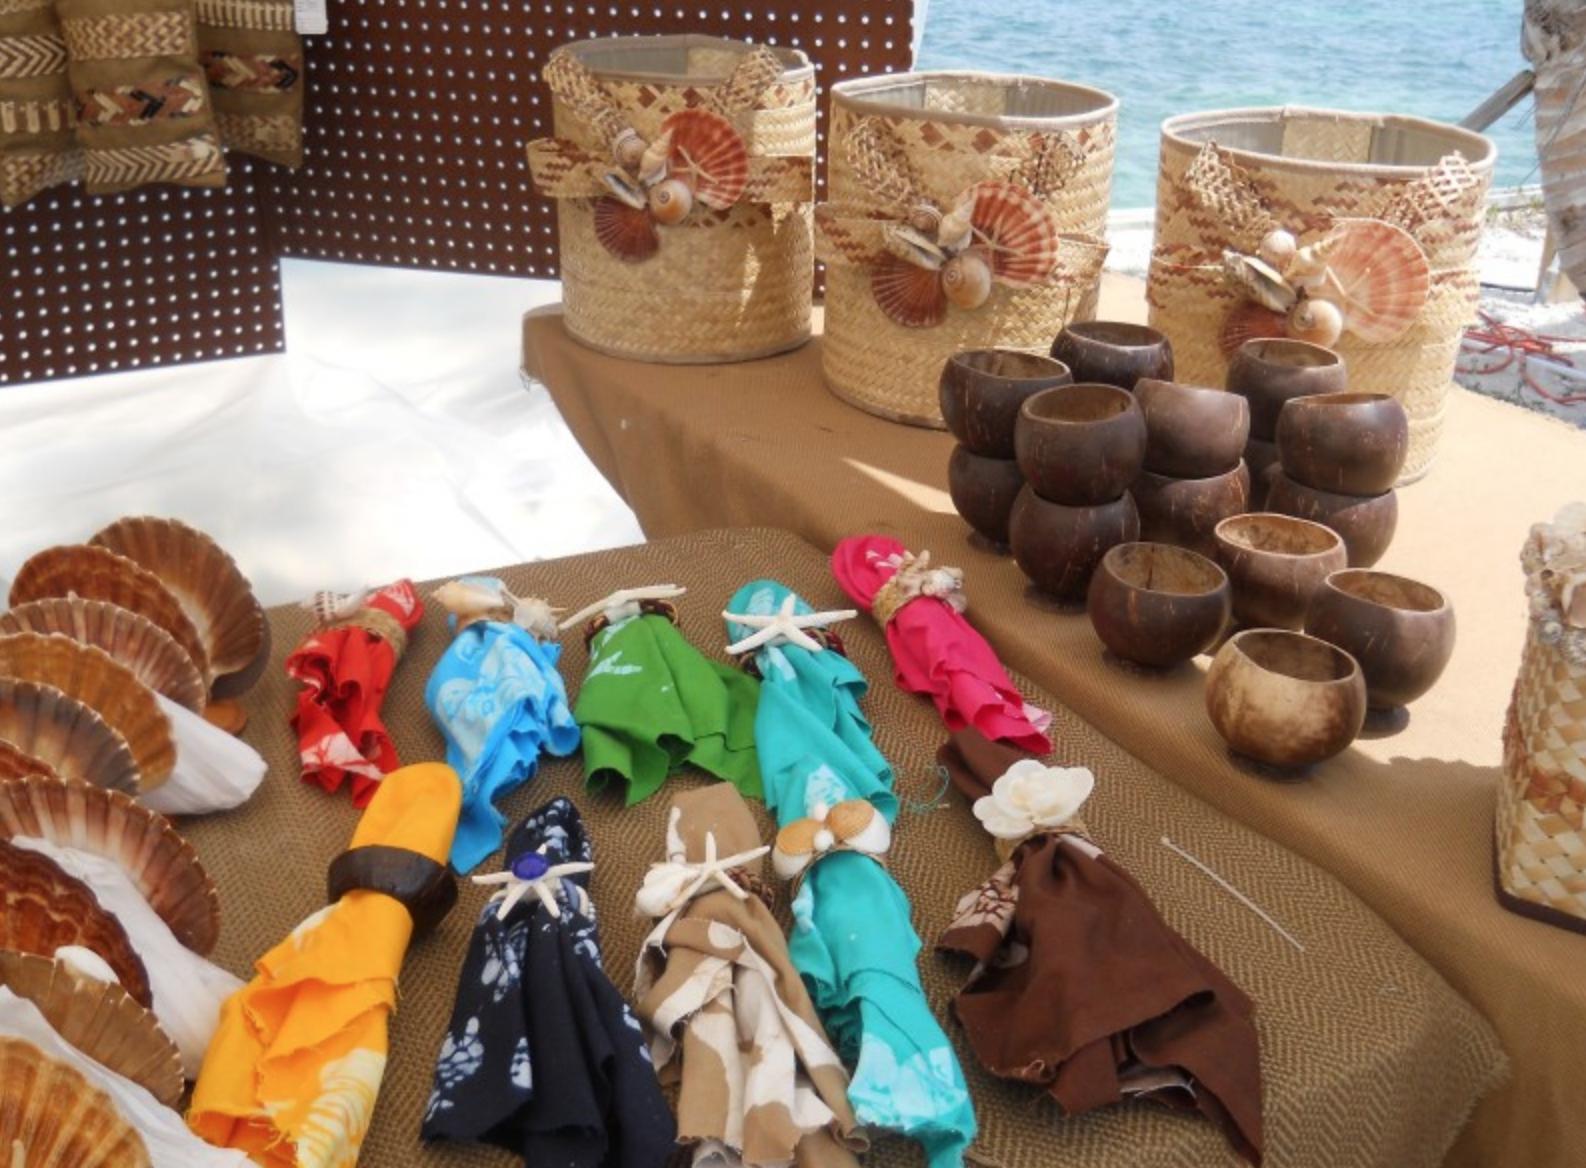 Bahamas Arts & Crafts Festival